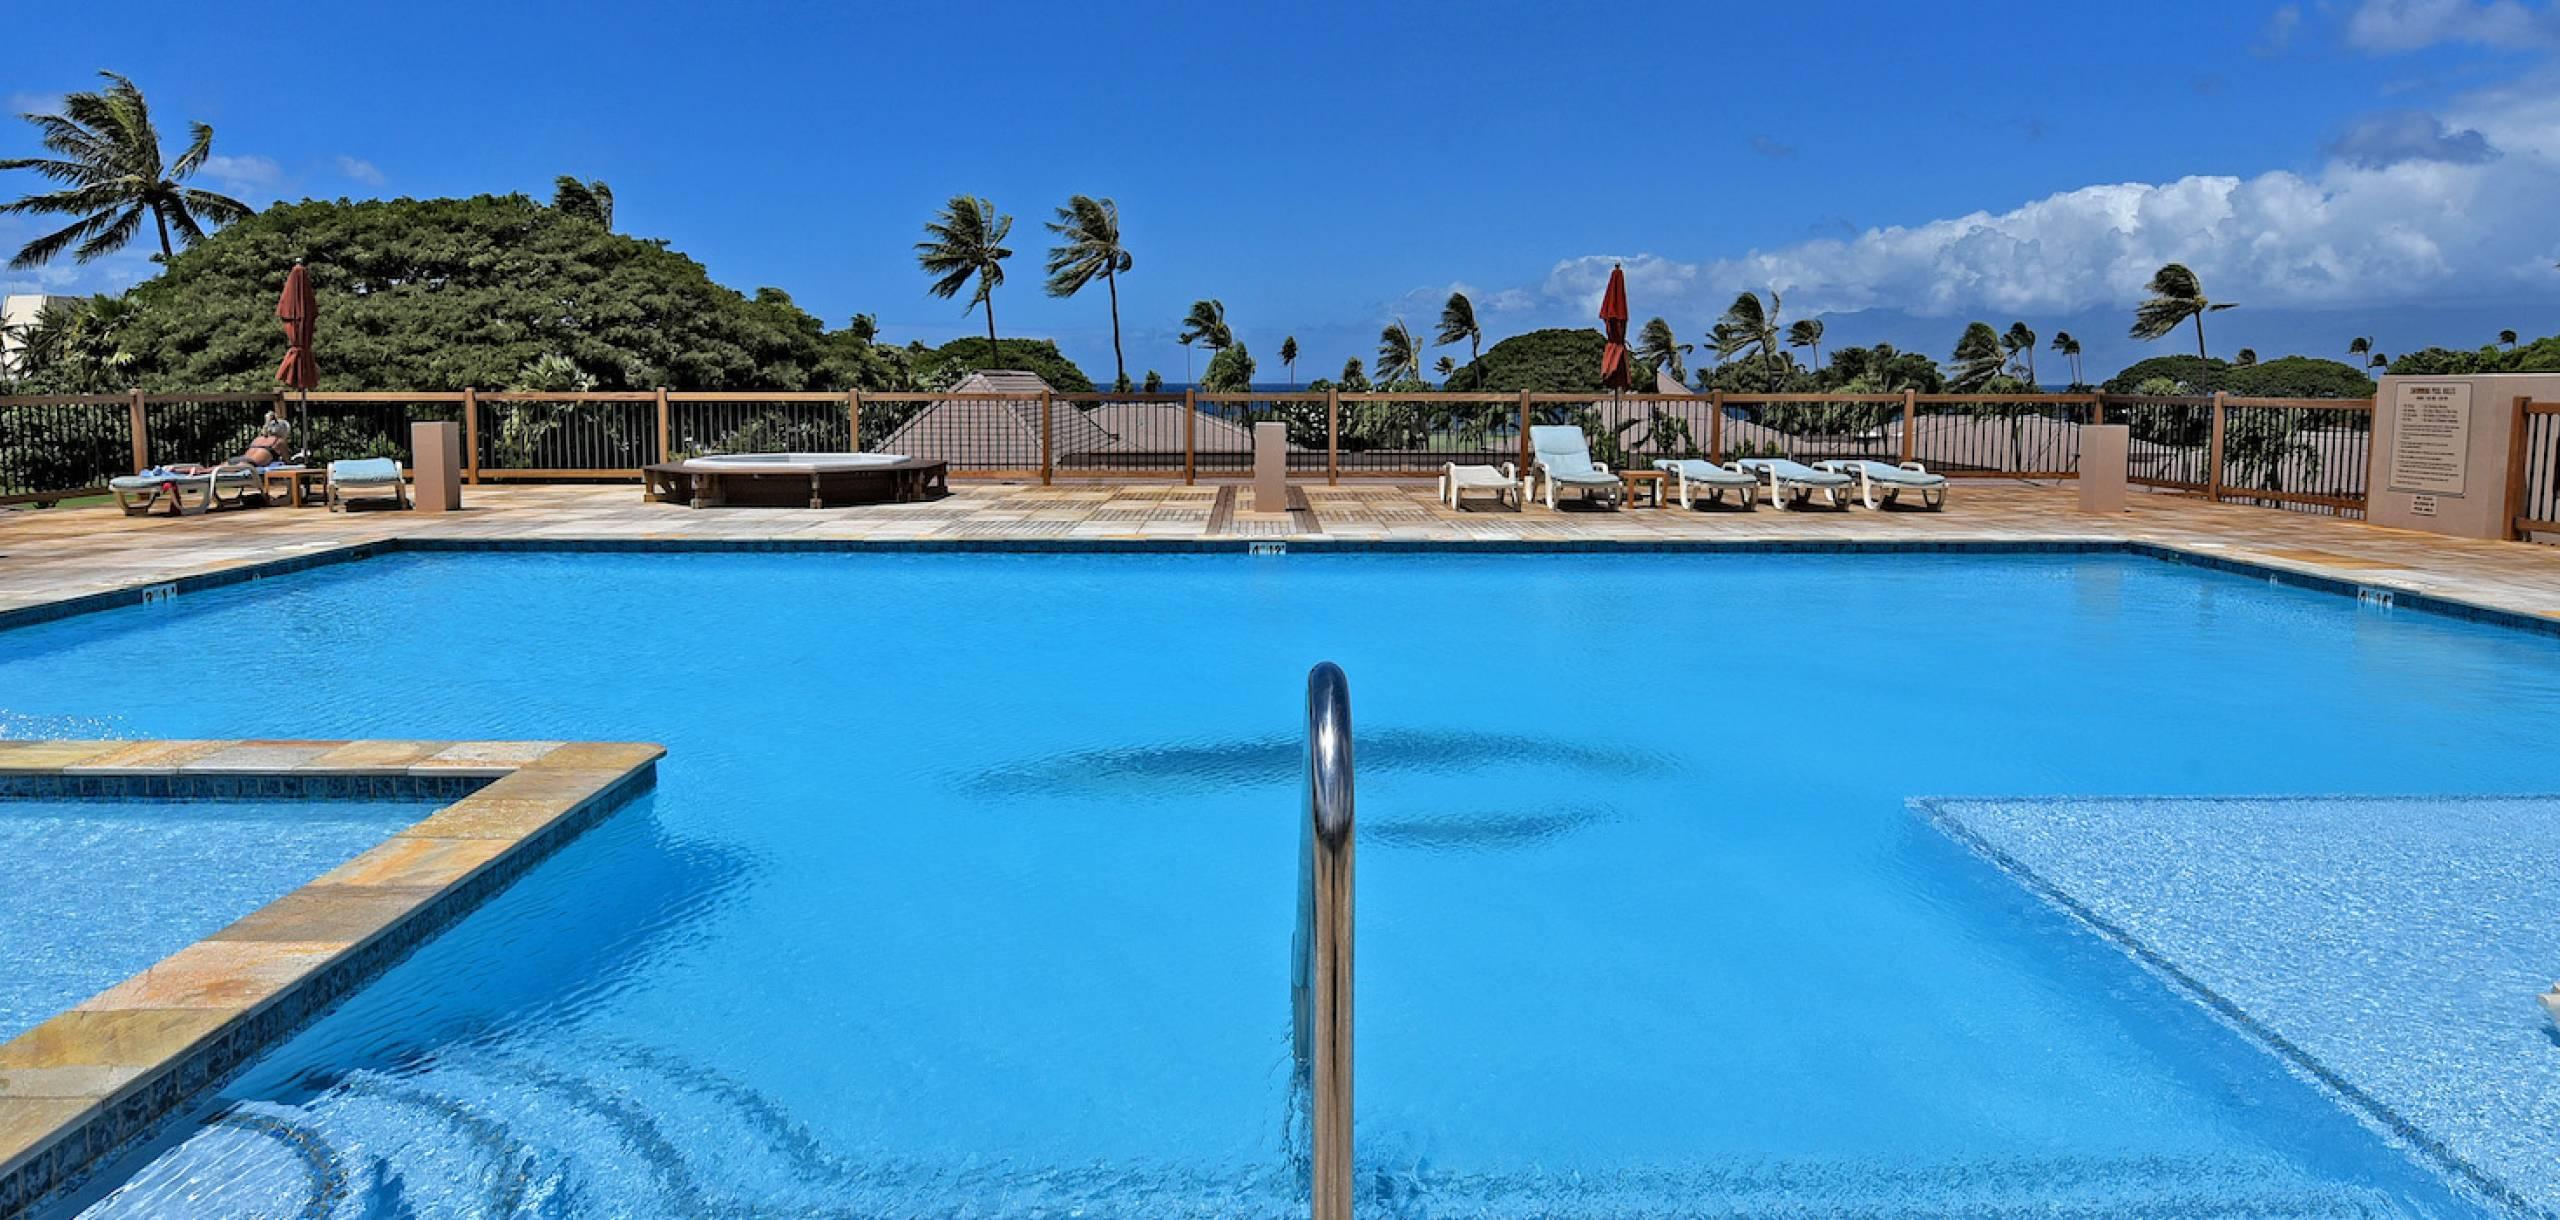 Maui Kaanapali Pool